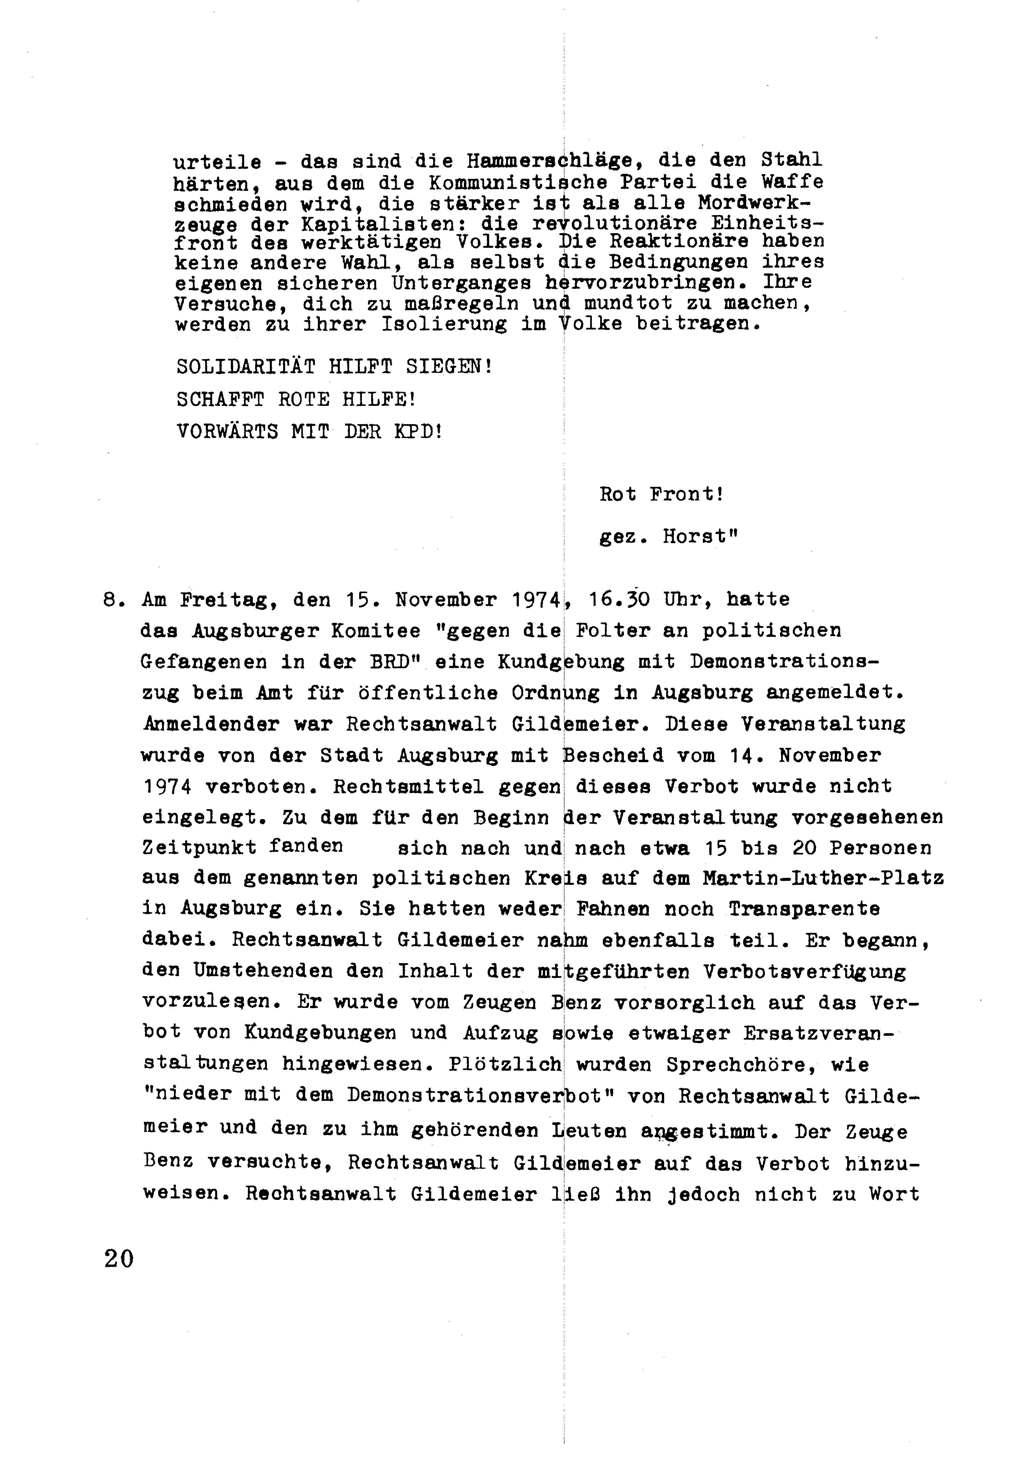 RHeV_Anschuldigung_RA_Gildemeier_Seite_20